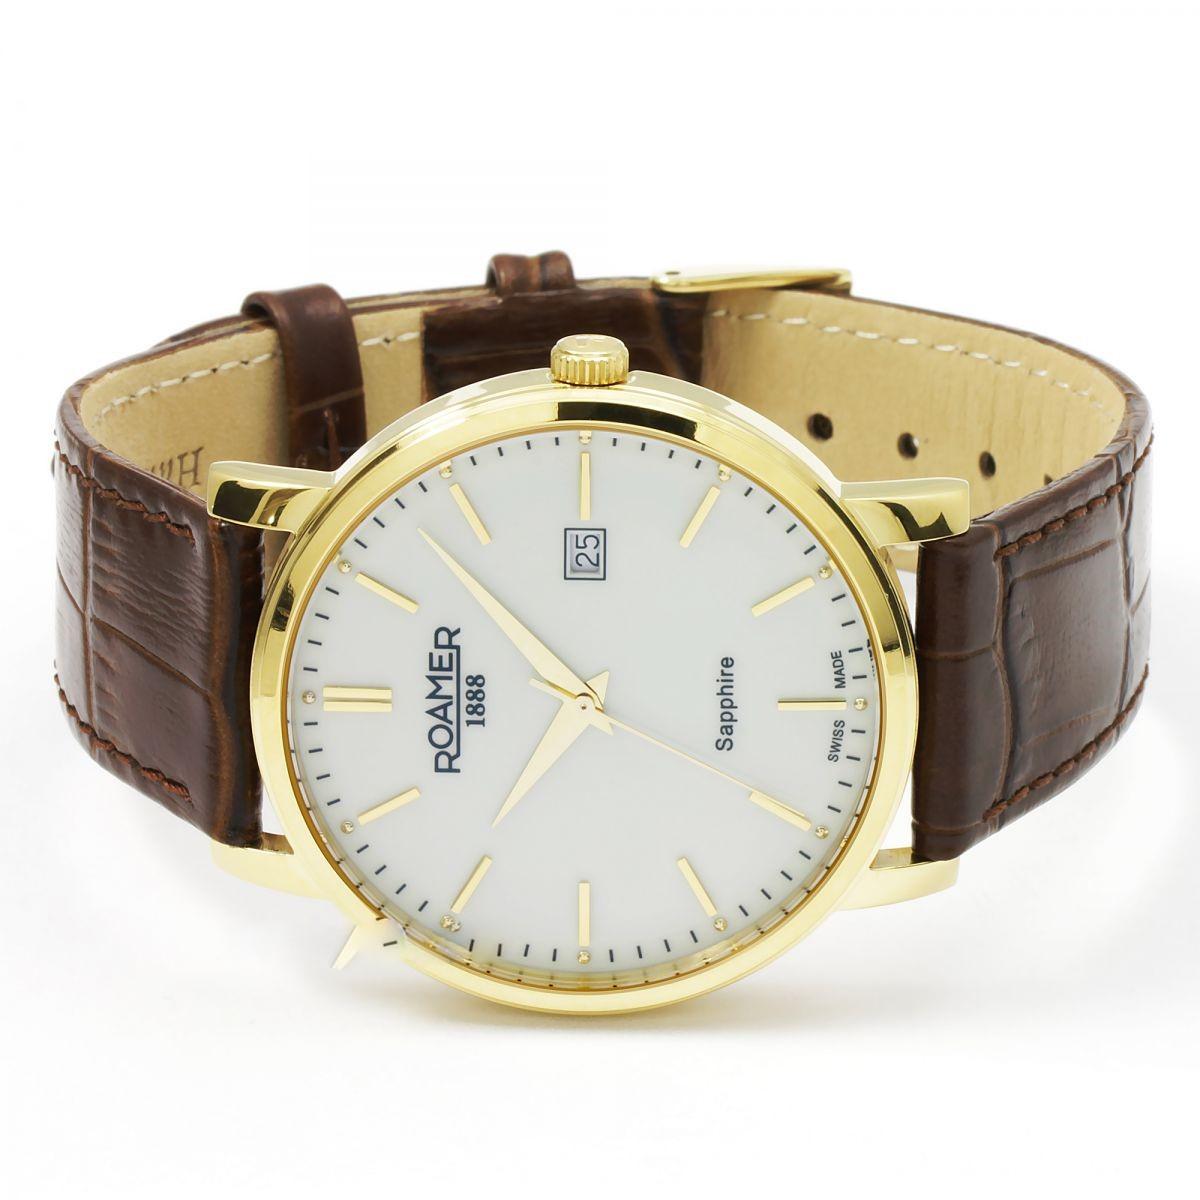 10 gyönyörű óra valentin napra - Watch Fashion aff4d251f1